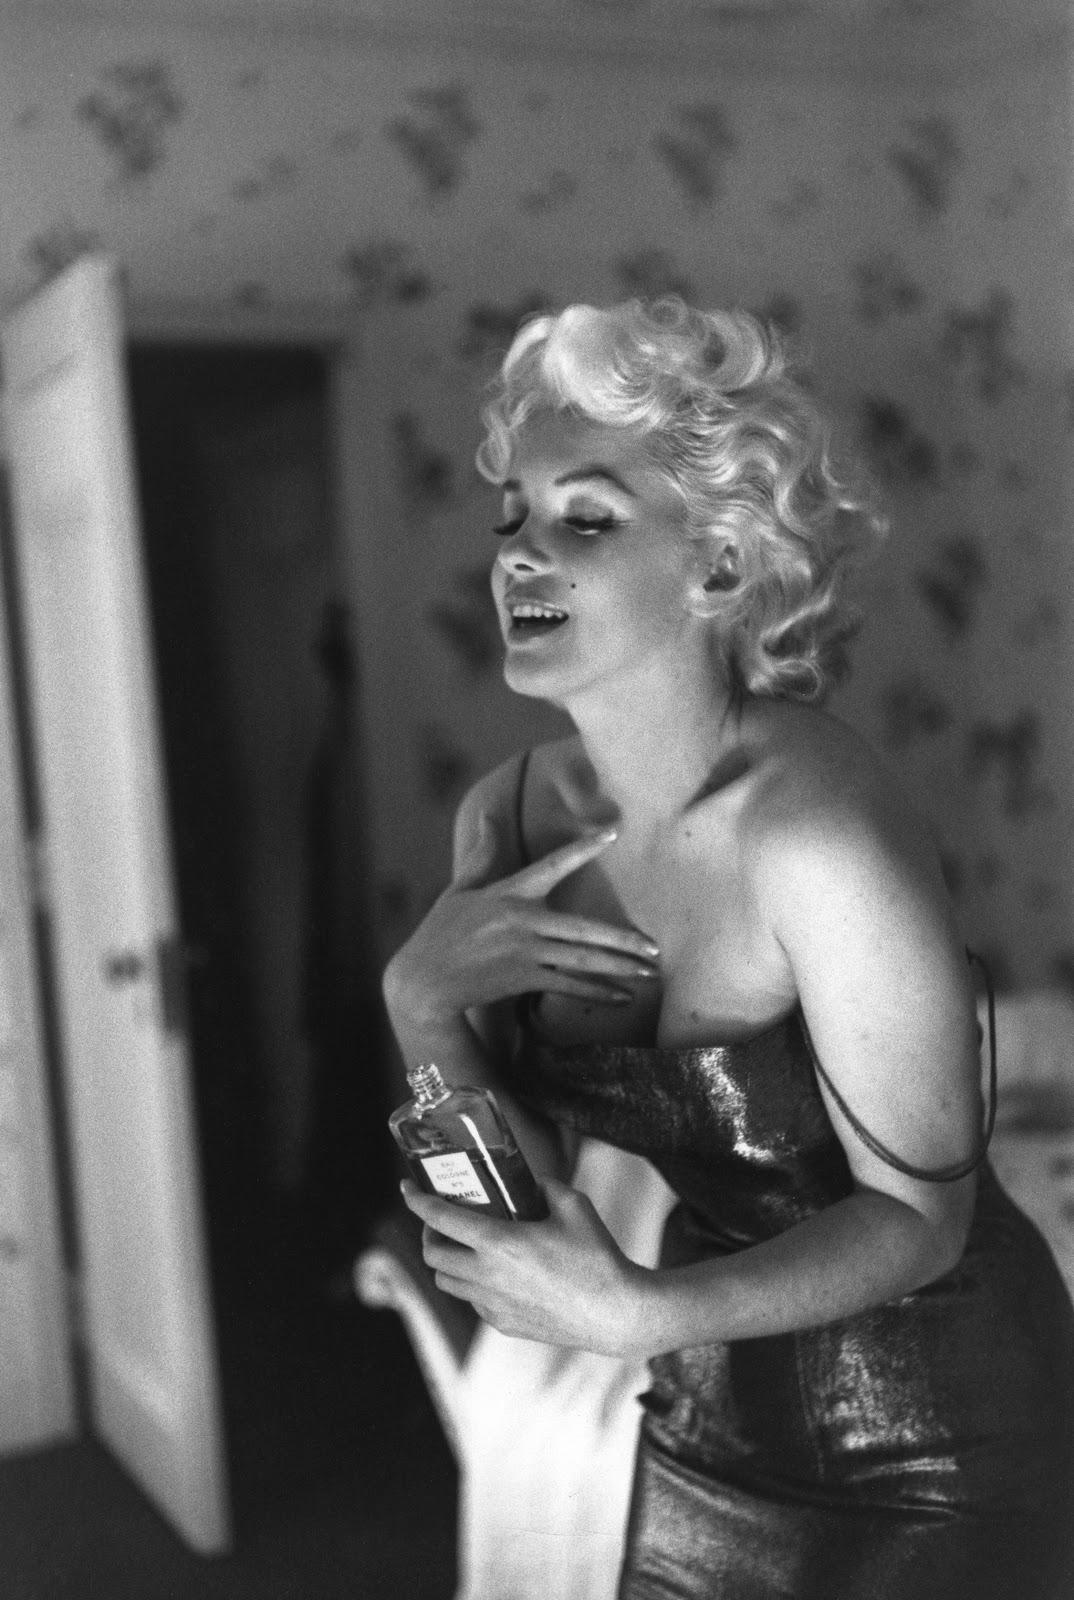 http://3.bp.blogspot.com/-6f-swzOE6pQ/TufPln_FkjI/AAAAAAAAA-I/i3b-aZeW4vE/s1600/1955+Marilyn+Monroe.jpg